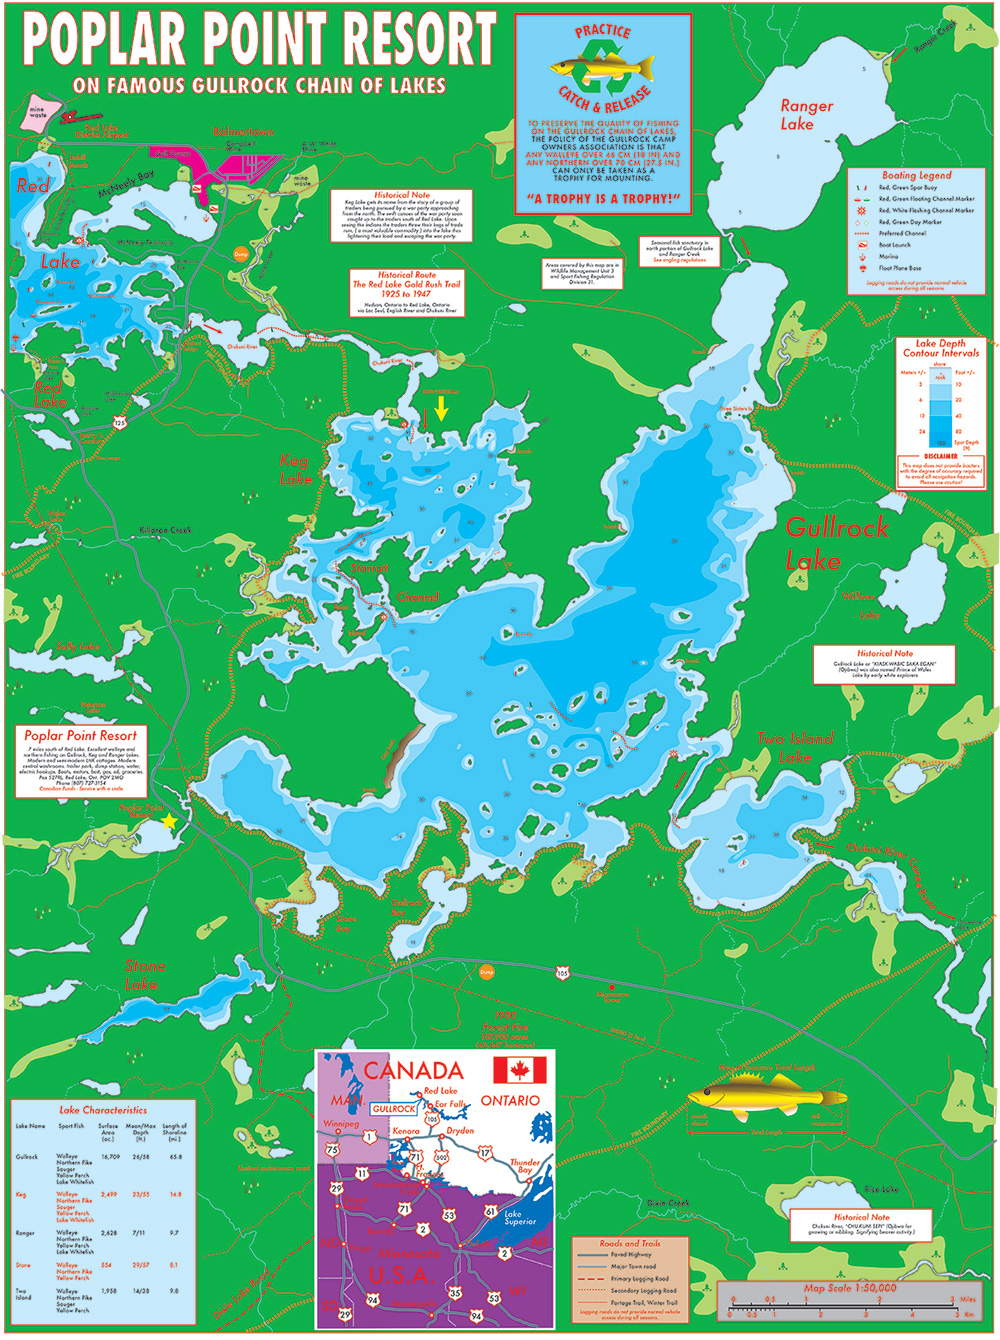 Gullrock Lake Map | Poplar Point Resort on